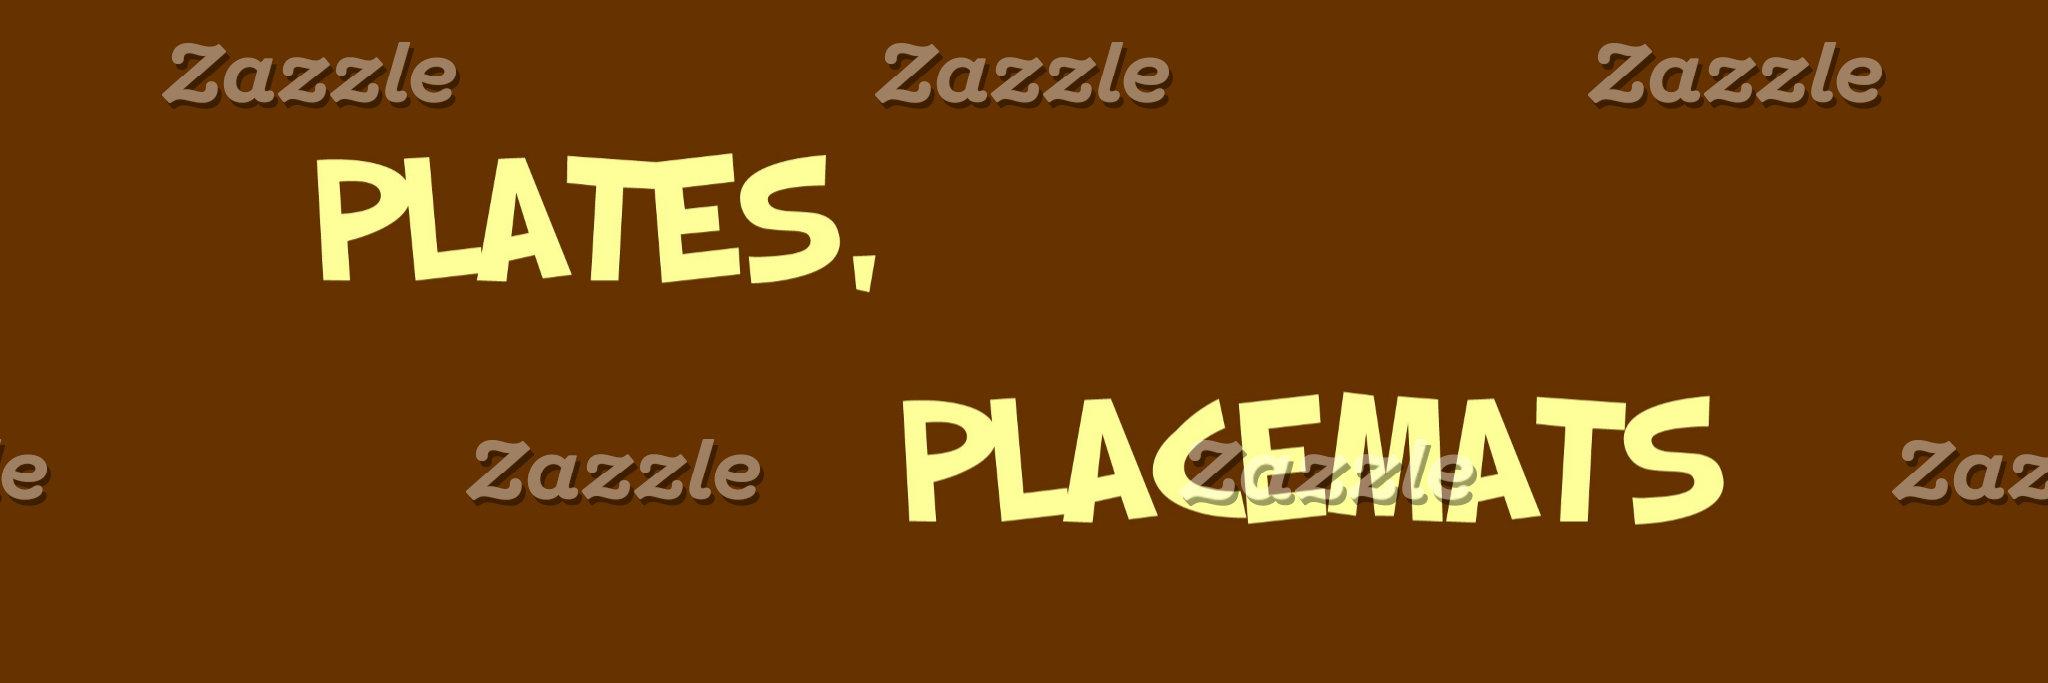 PLATES, PLACEMATS